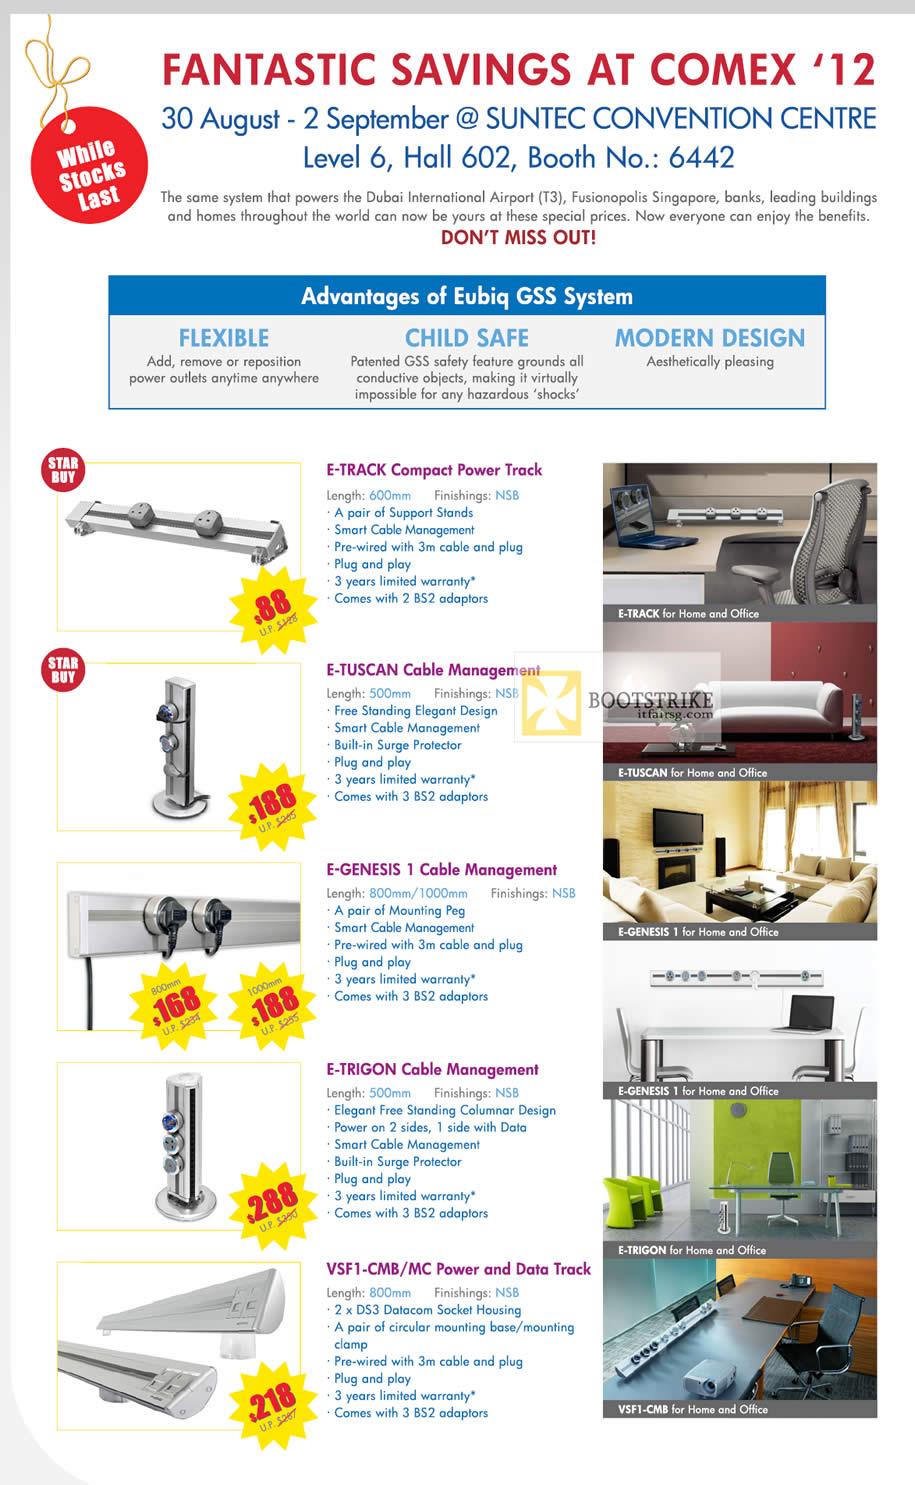 COMEX 2012 price list image brochure of Eubiq GSS Flexible Power Outlet System E-Track, E-Tuscan, E-Trigon, Cable Management, Features